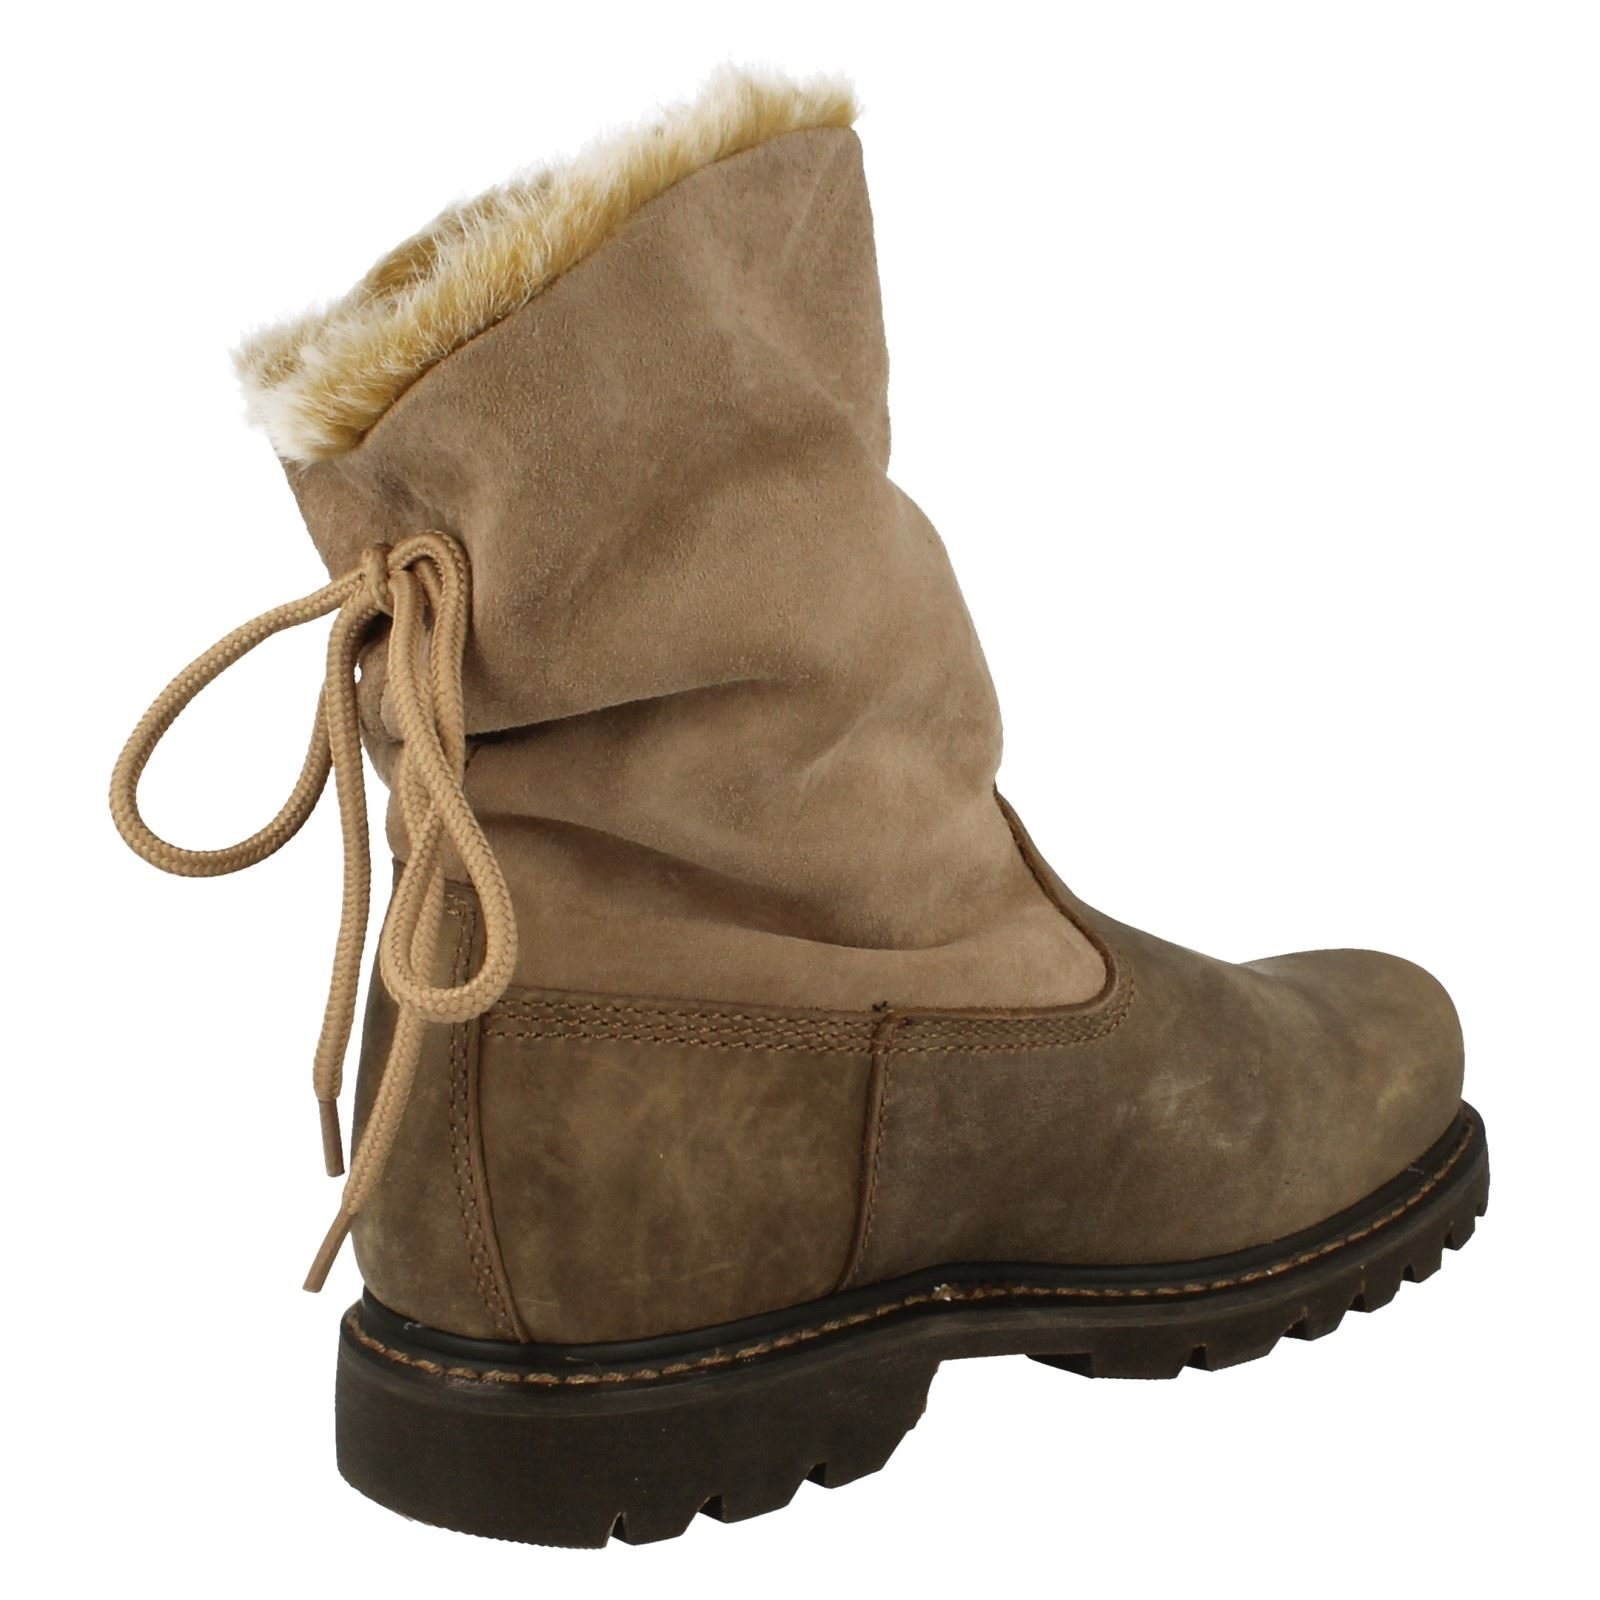 Ladies Ankle Details About Scrunch' Caterpillar Boots 'bruiser 5ASjc3R4Lq